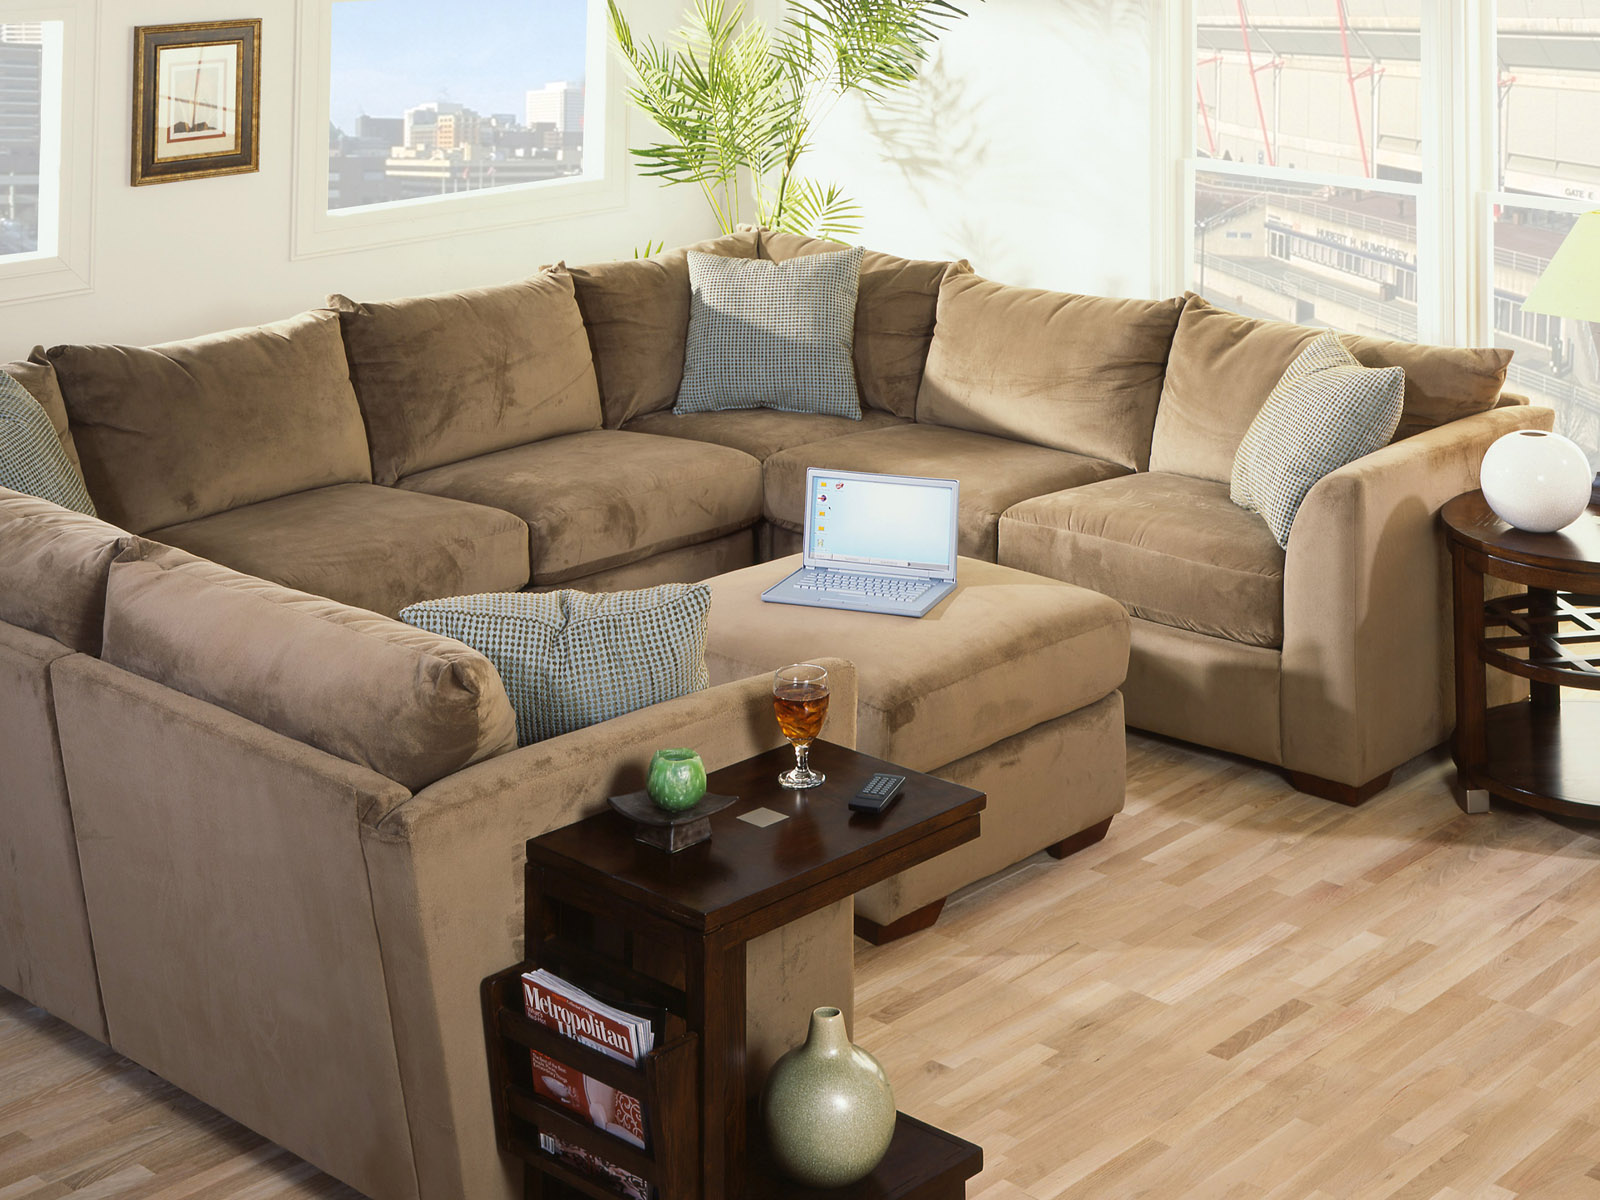 Перетяжка дивана замшей